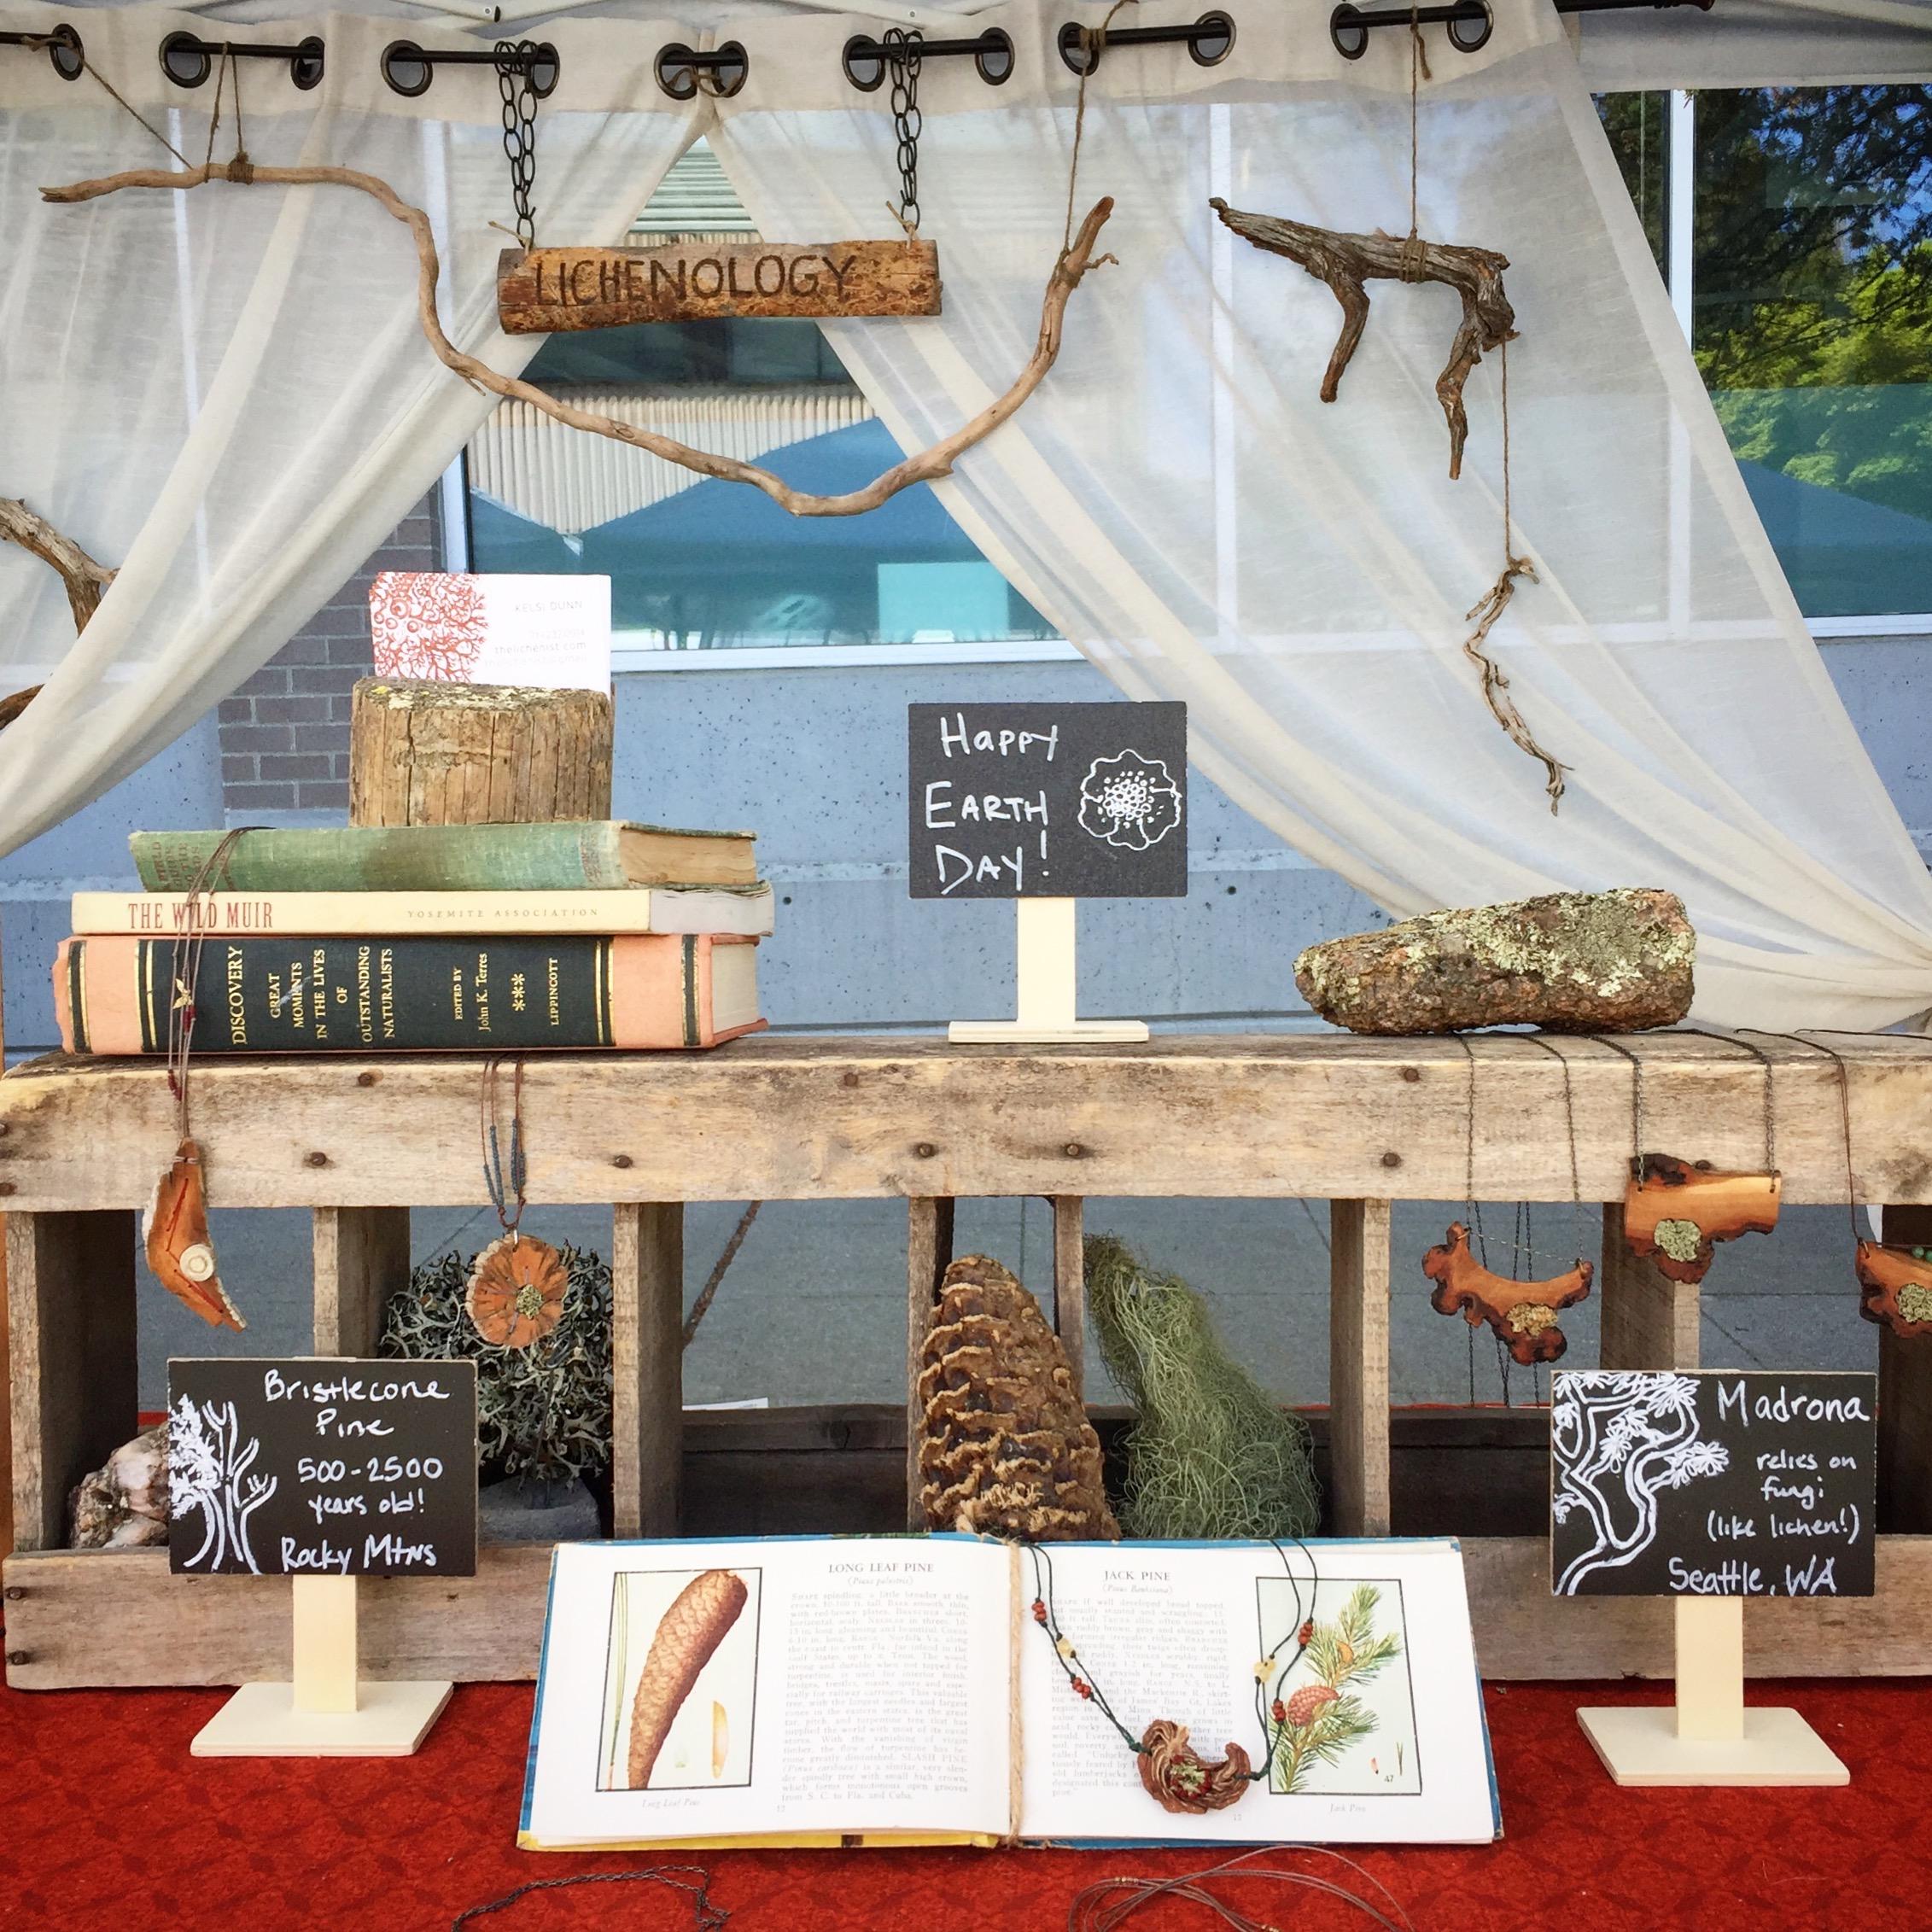 Lichenology market booth display